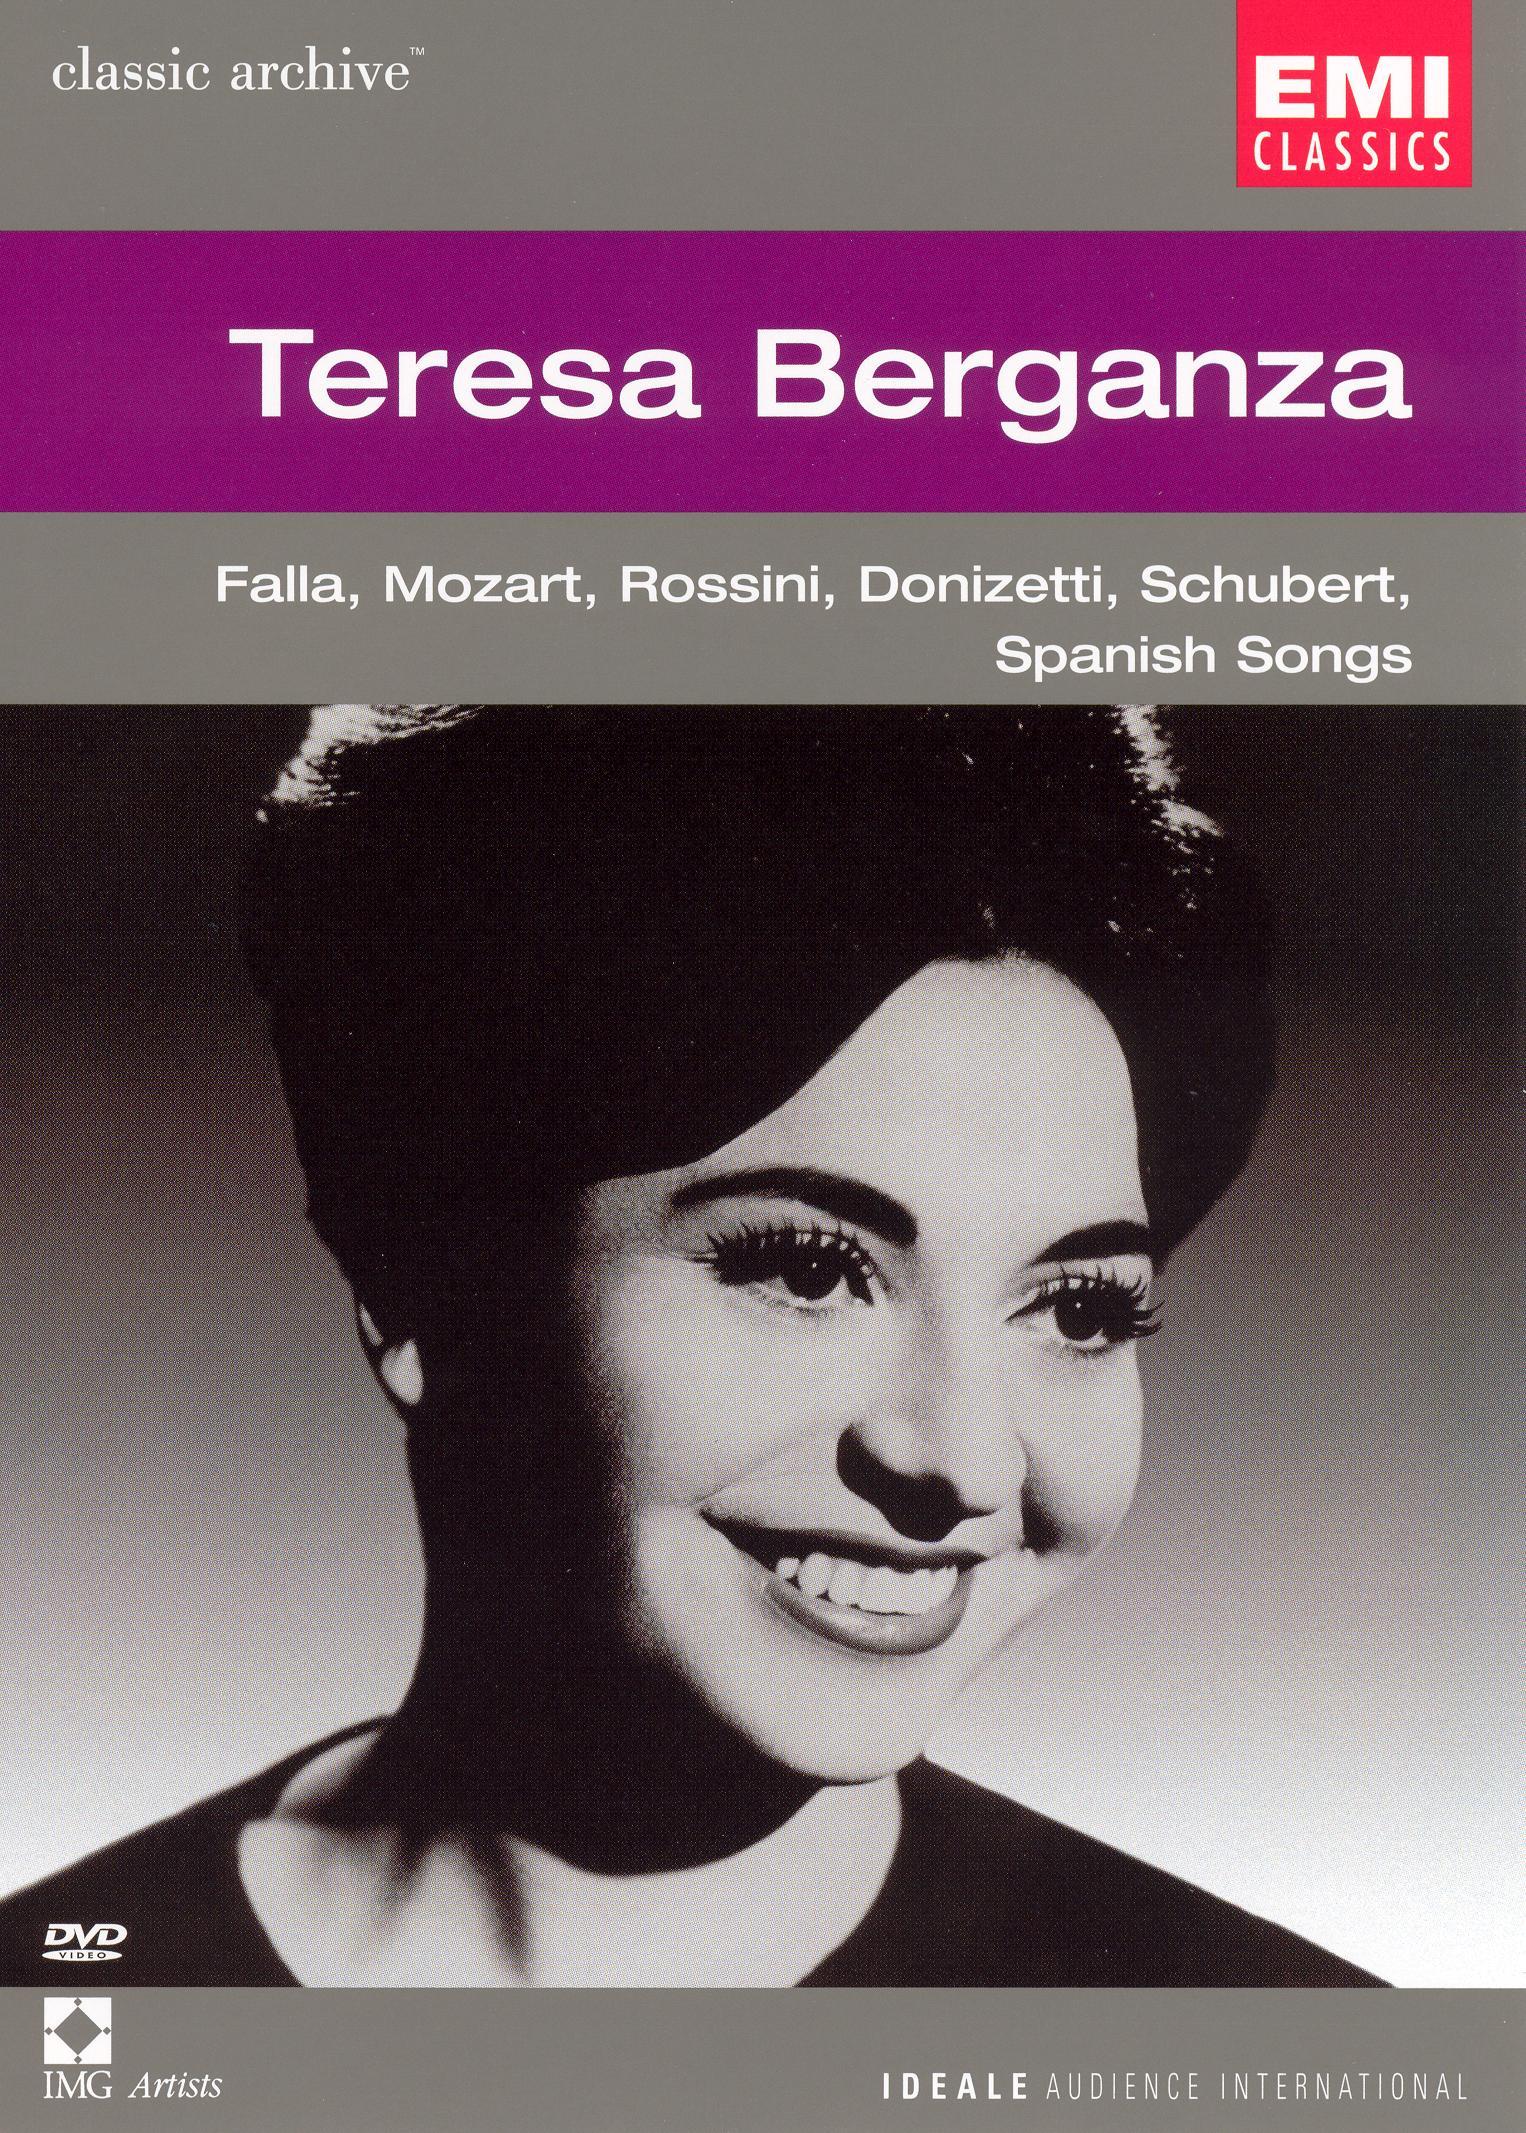 Classic Archive: Teresa Berganza